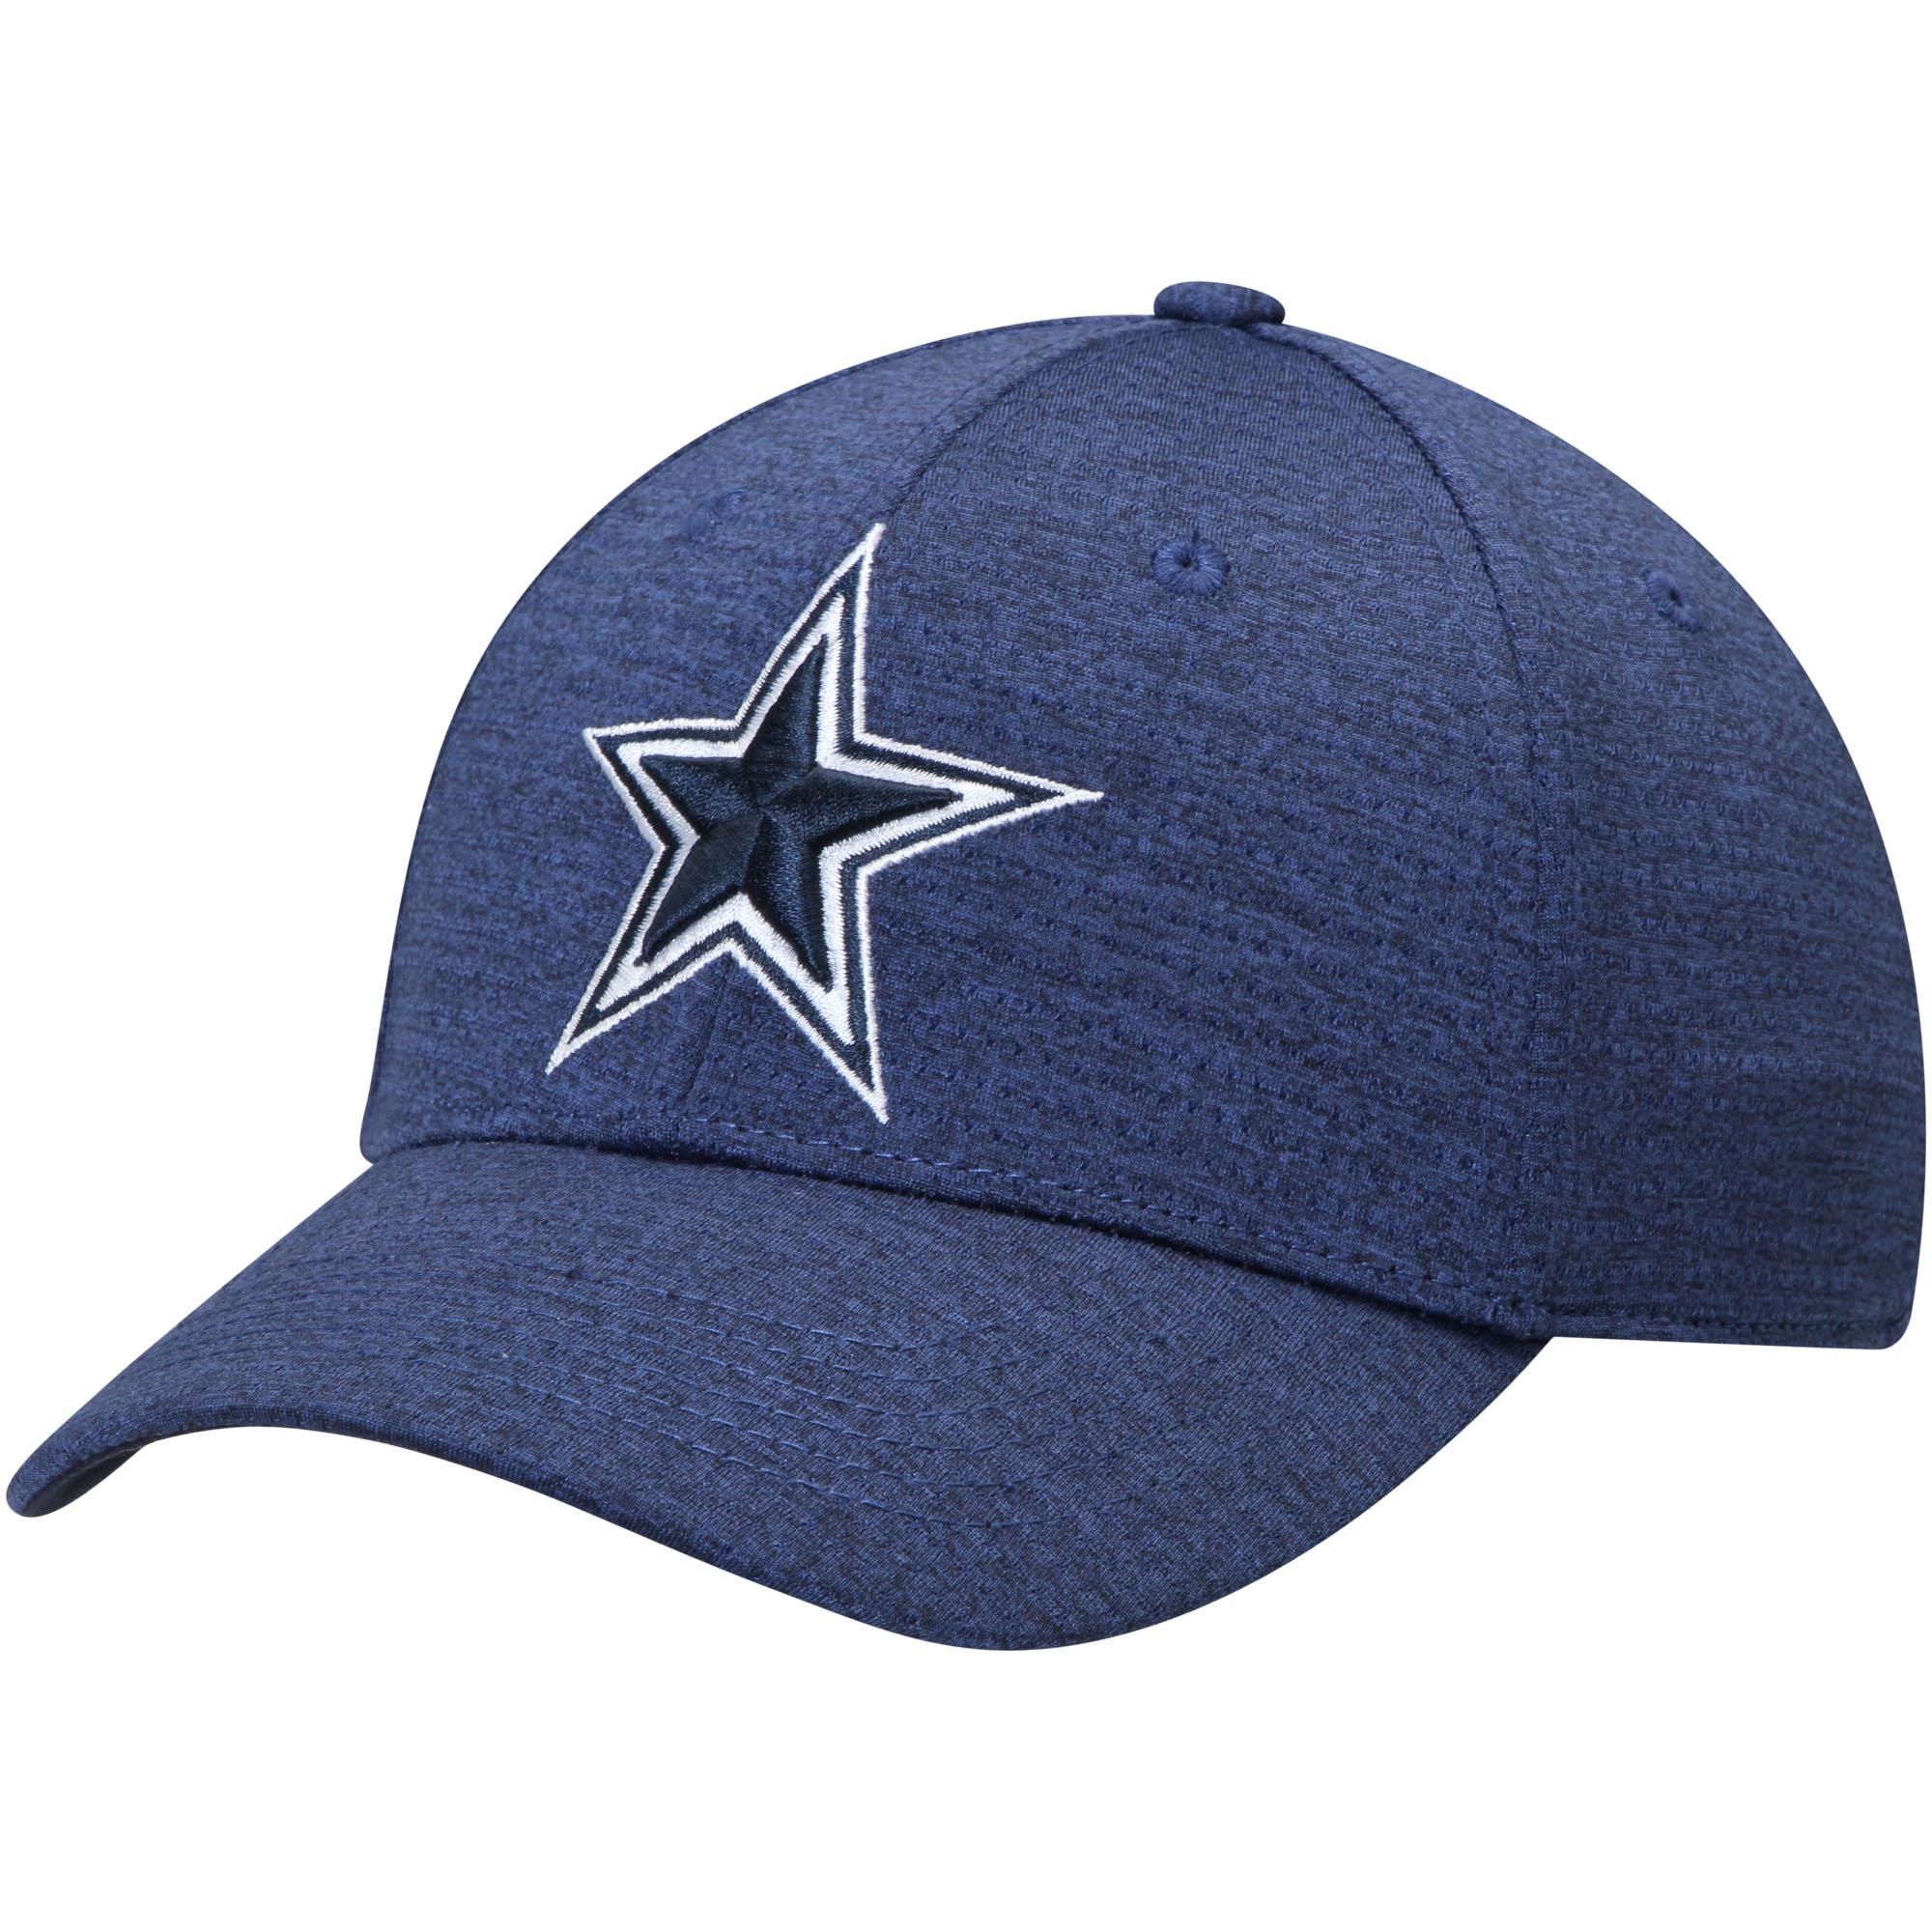 Dallas Cowboys Woodley Flex Hat - Heathered Navy